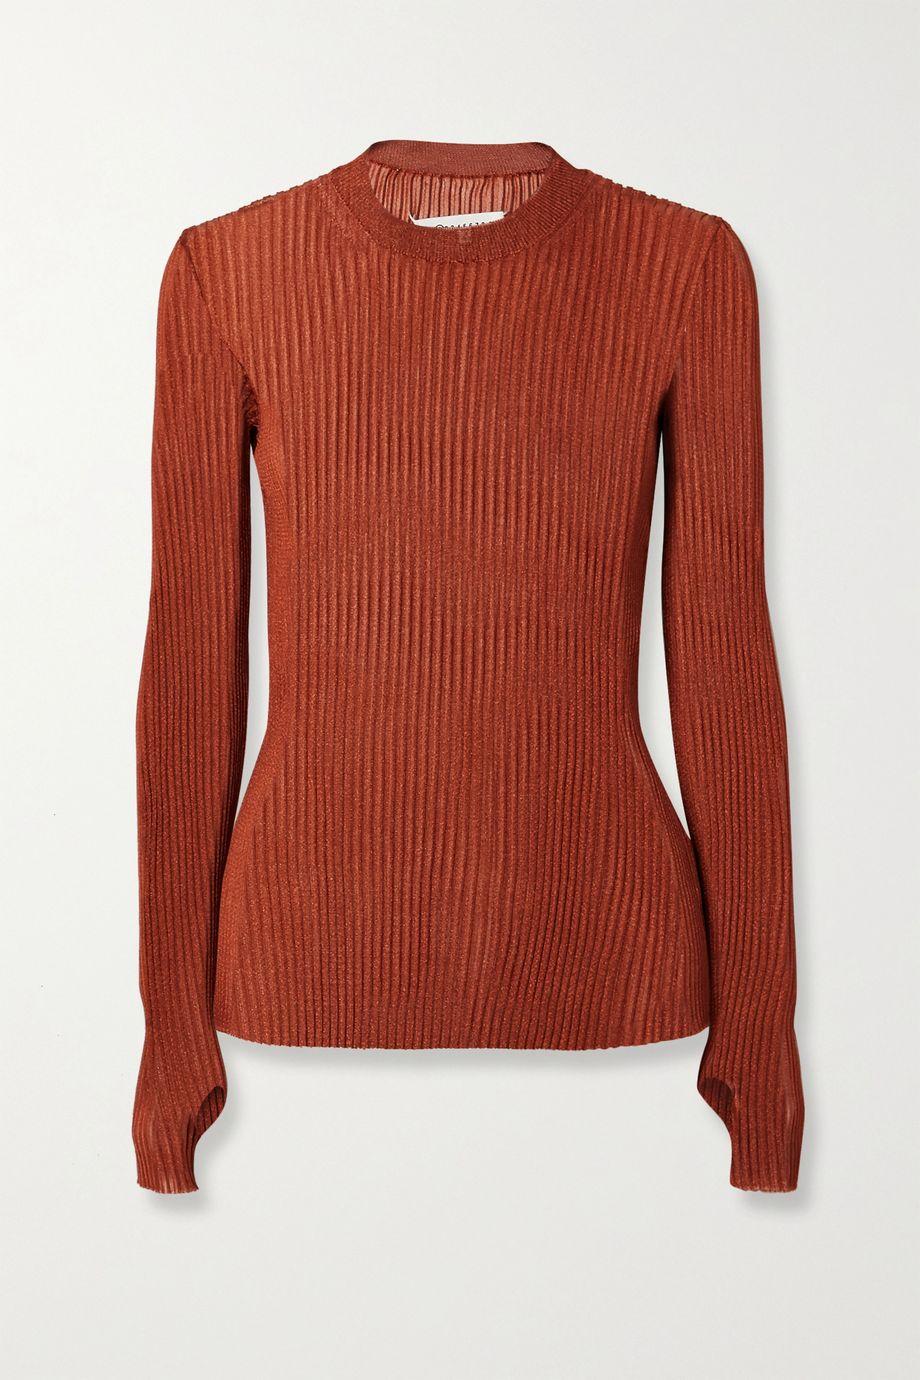 Maison Margiela 金属感罗纹针织毛衣